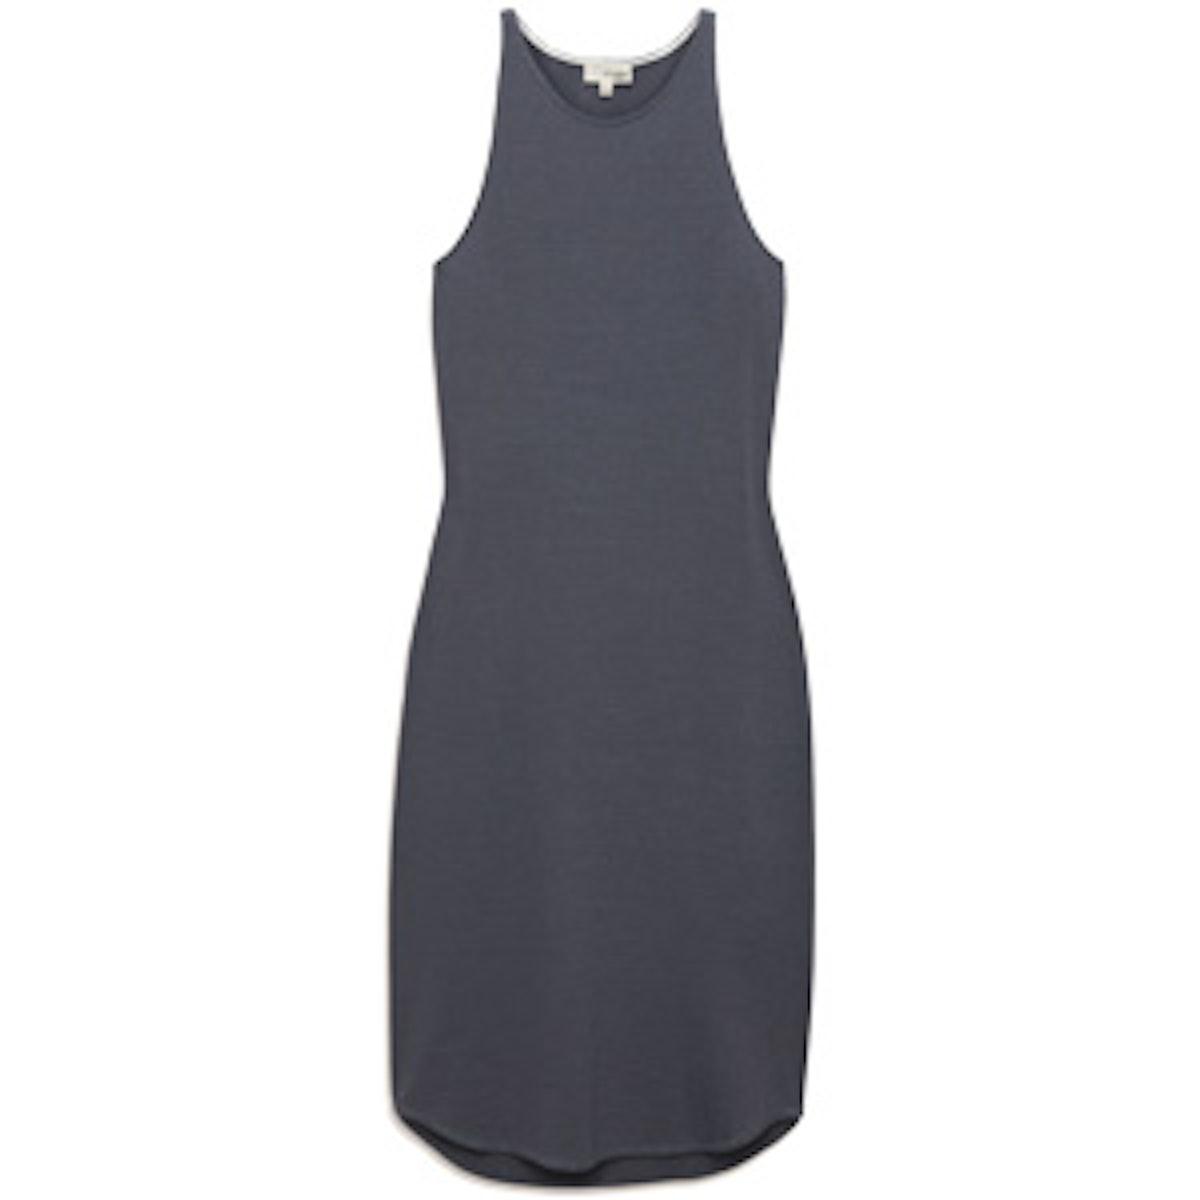 Wildred Free Chrissy Dress